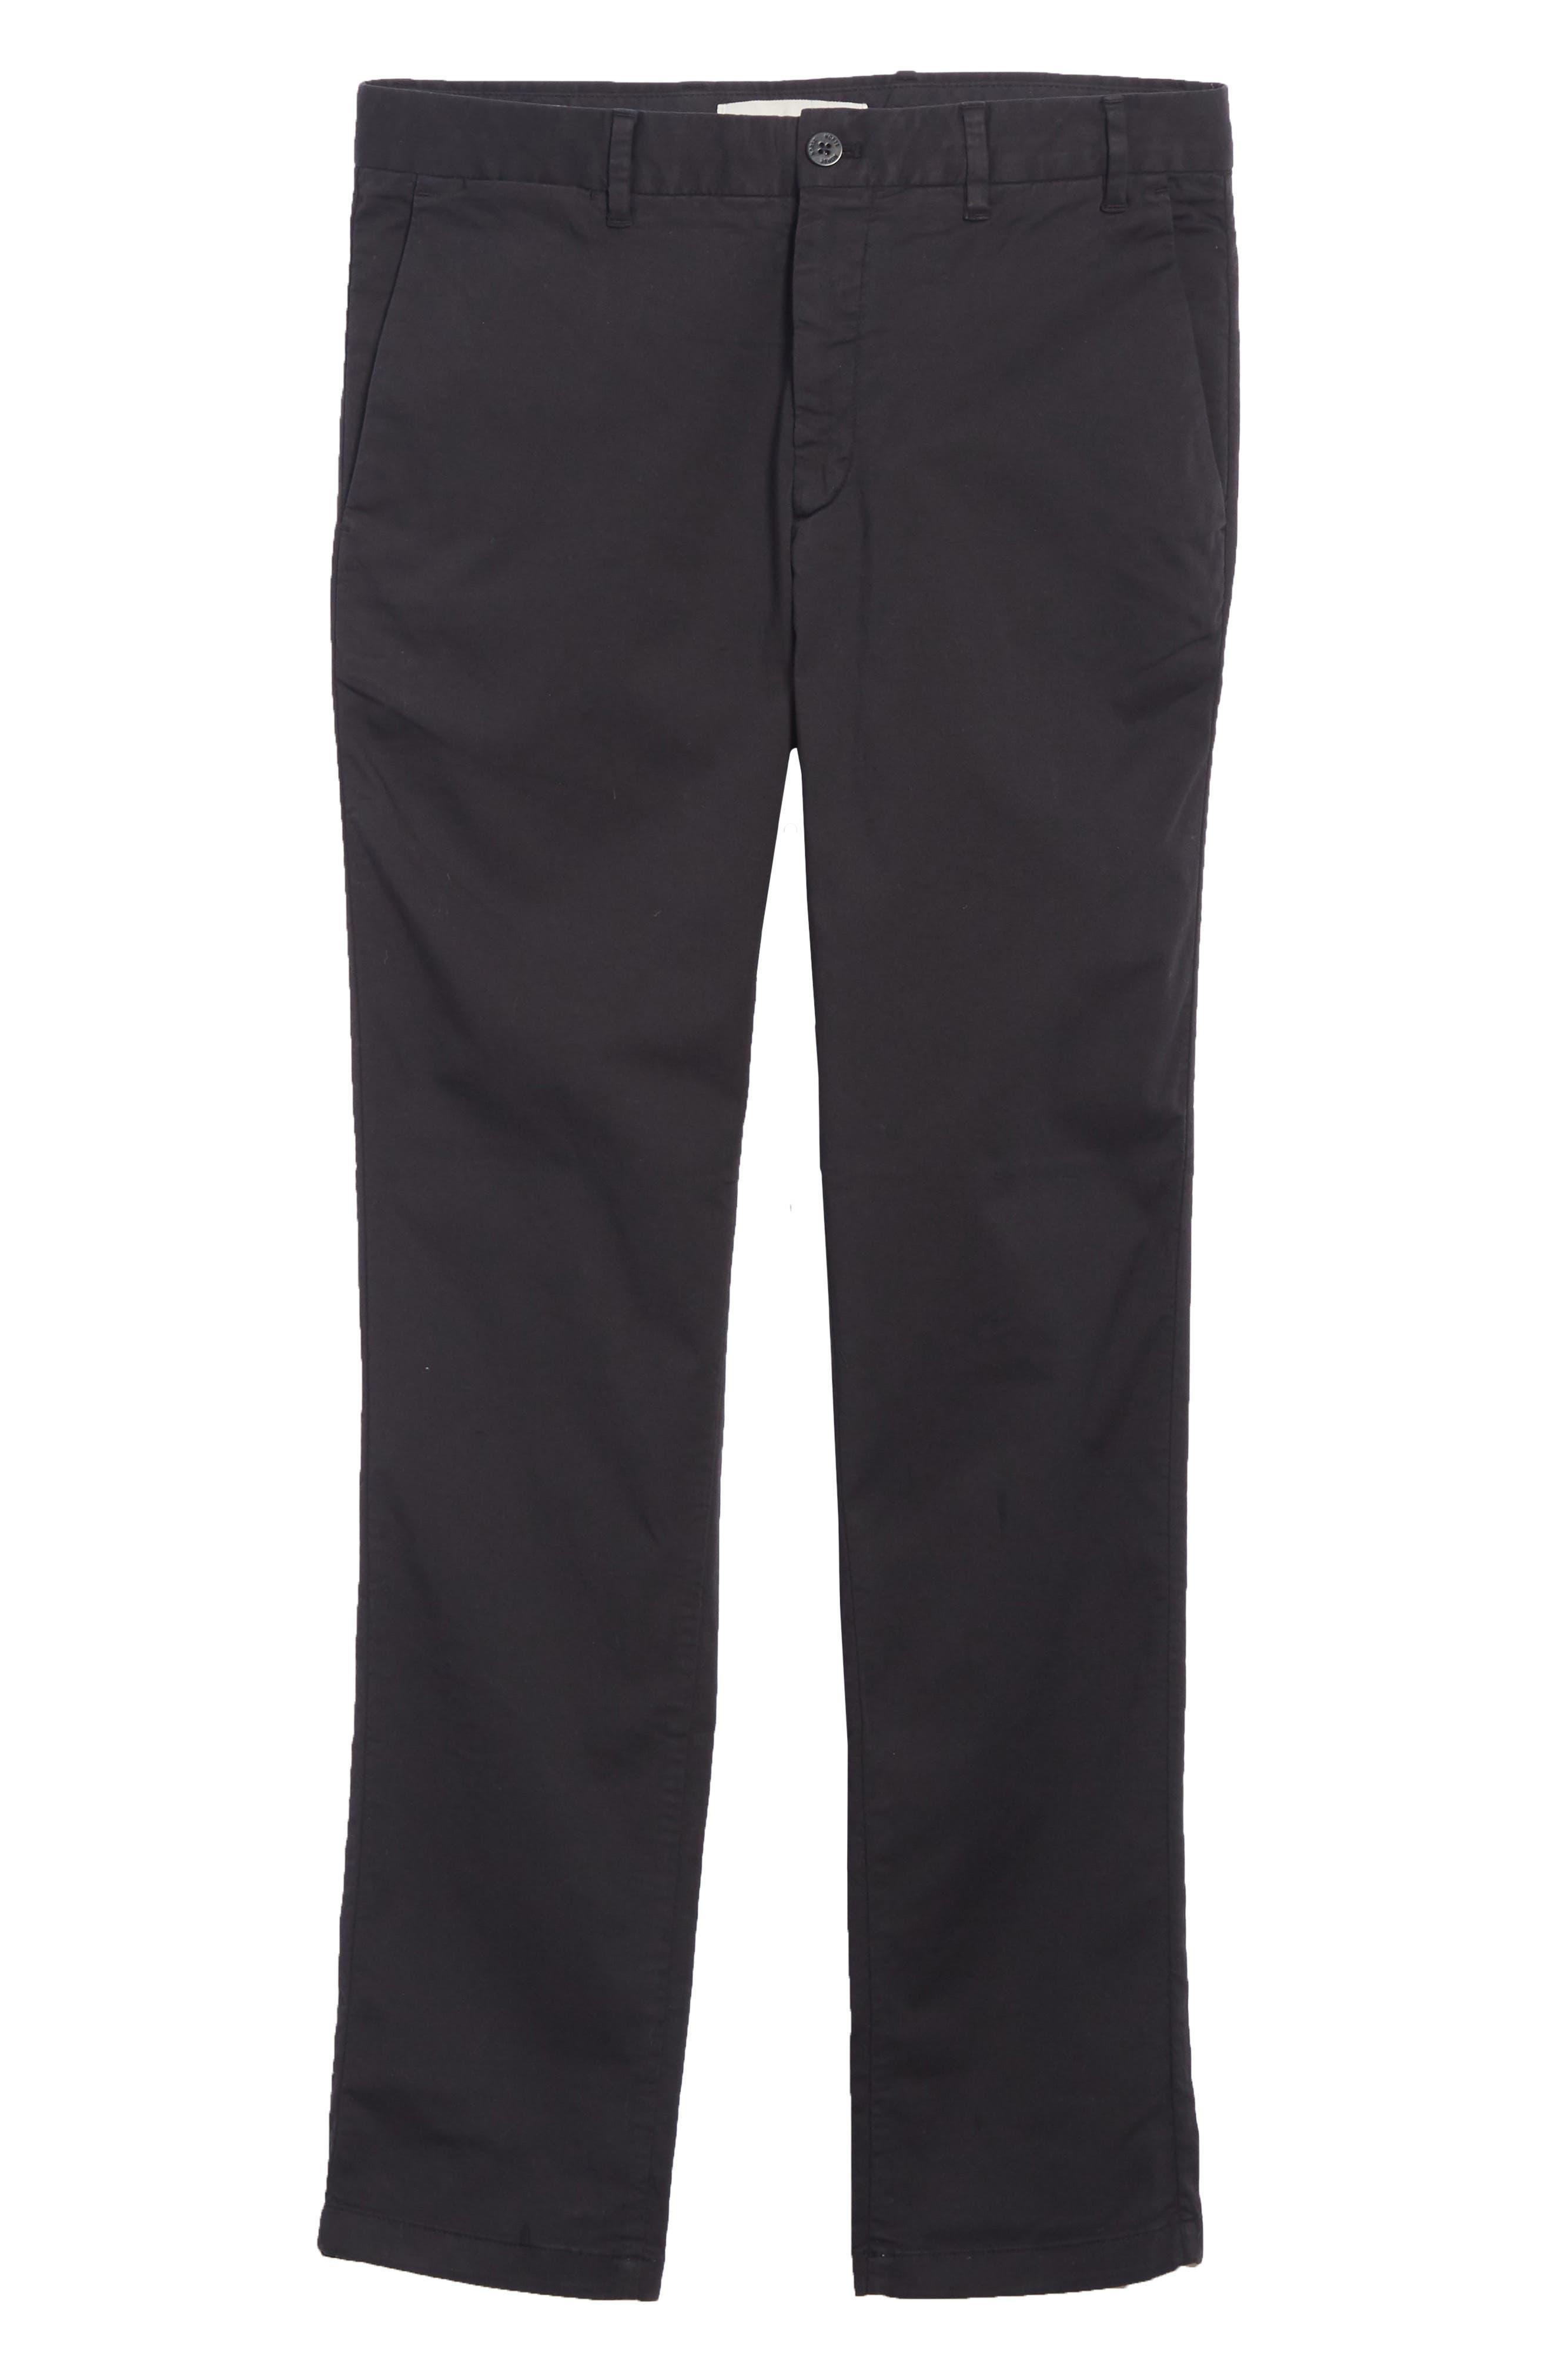 Aros Slim Fit Stretch Twill Pants,                             Alternate thumbnail 6, color,                             BLACK